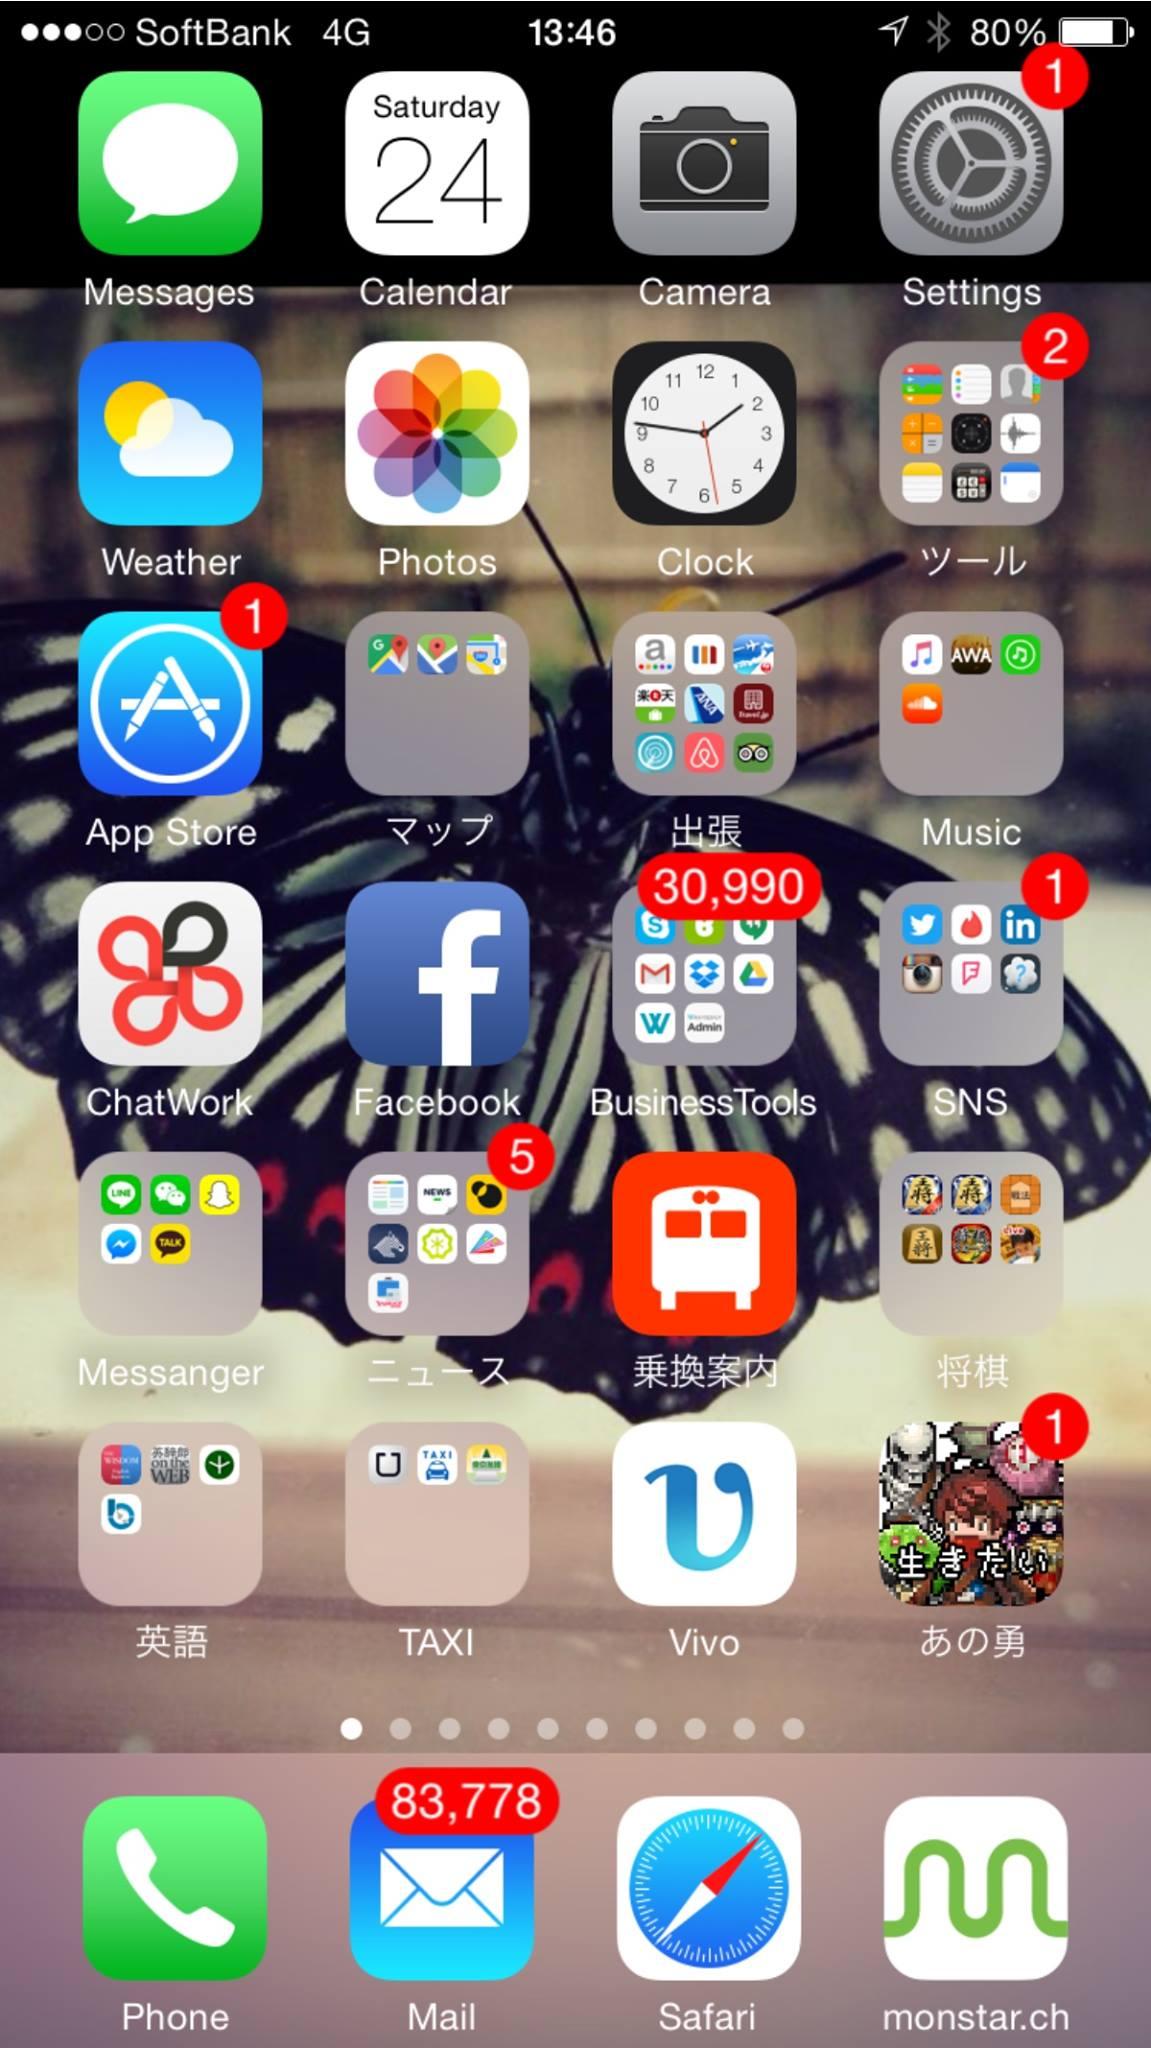 monsterlab_smartphone.jpg